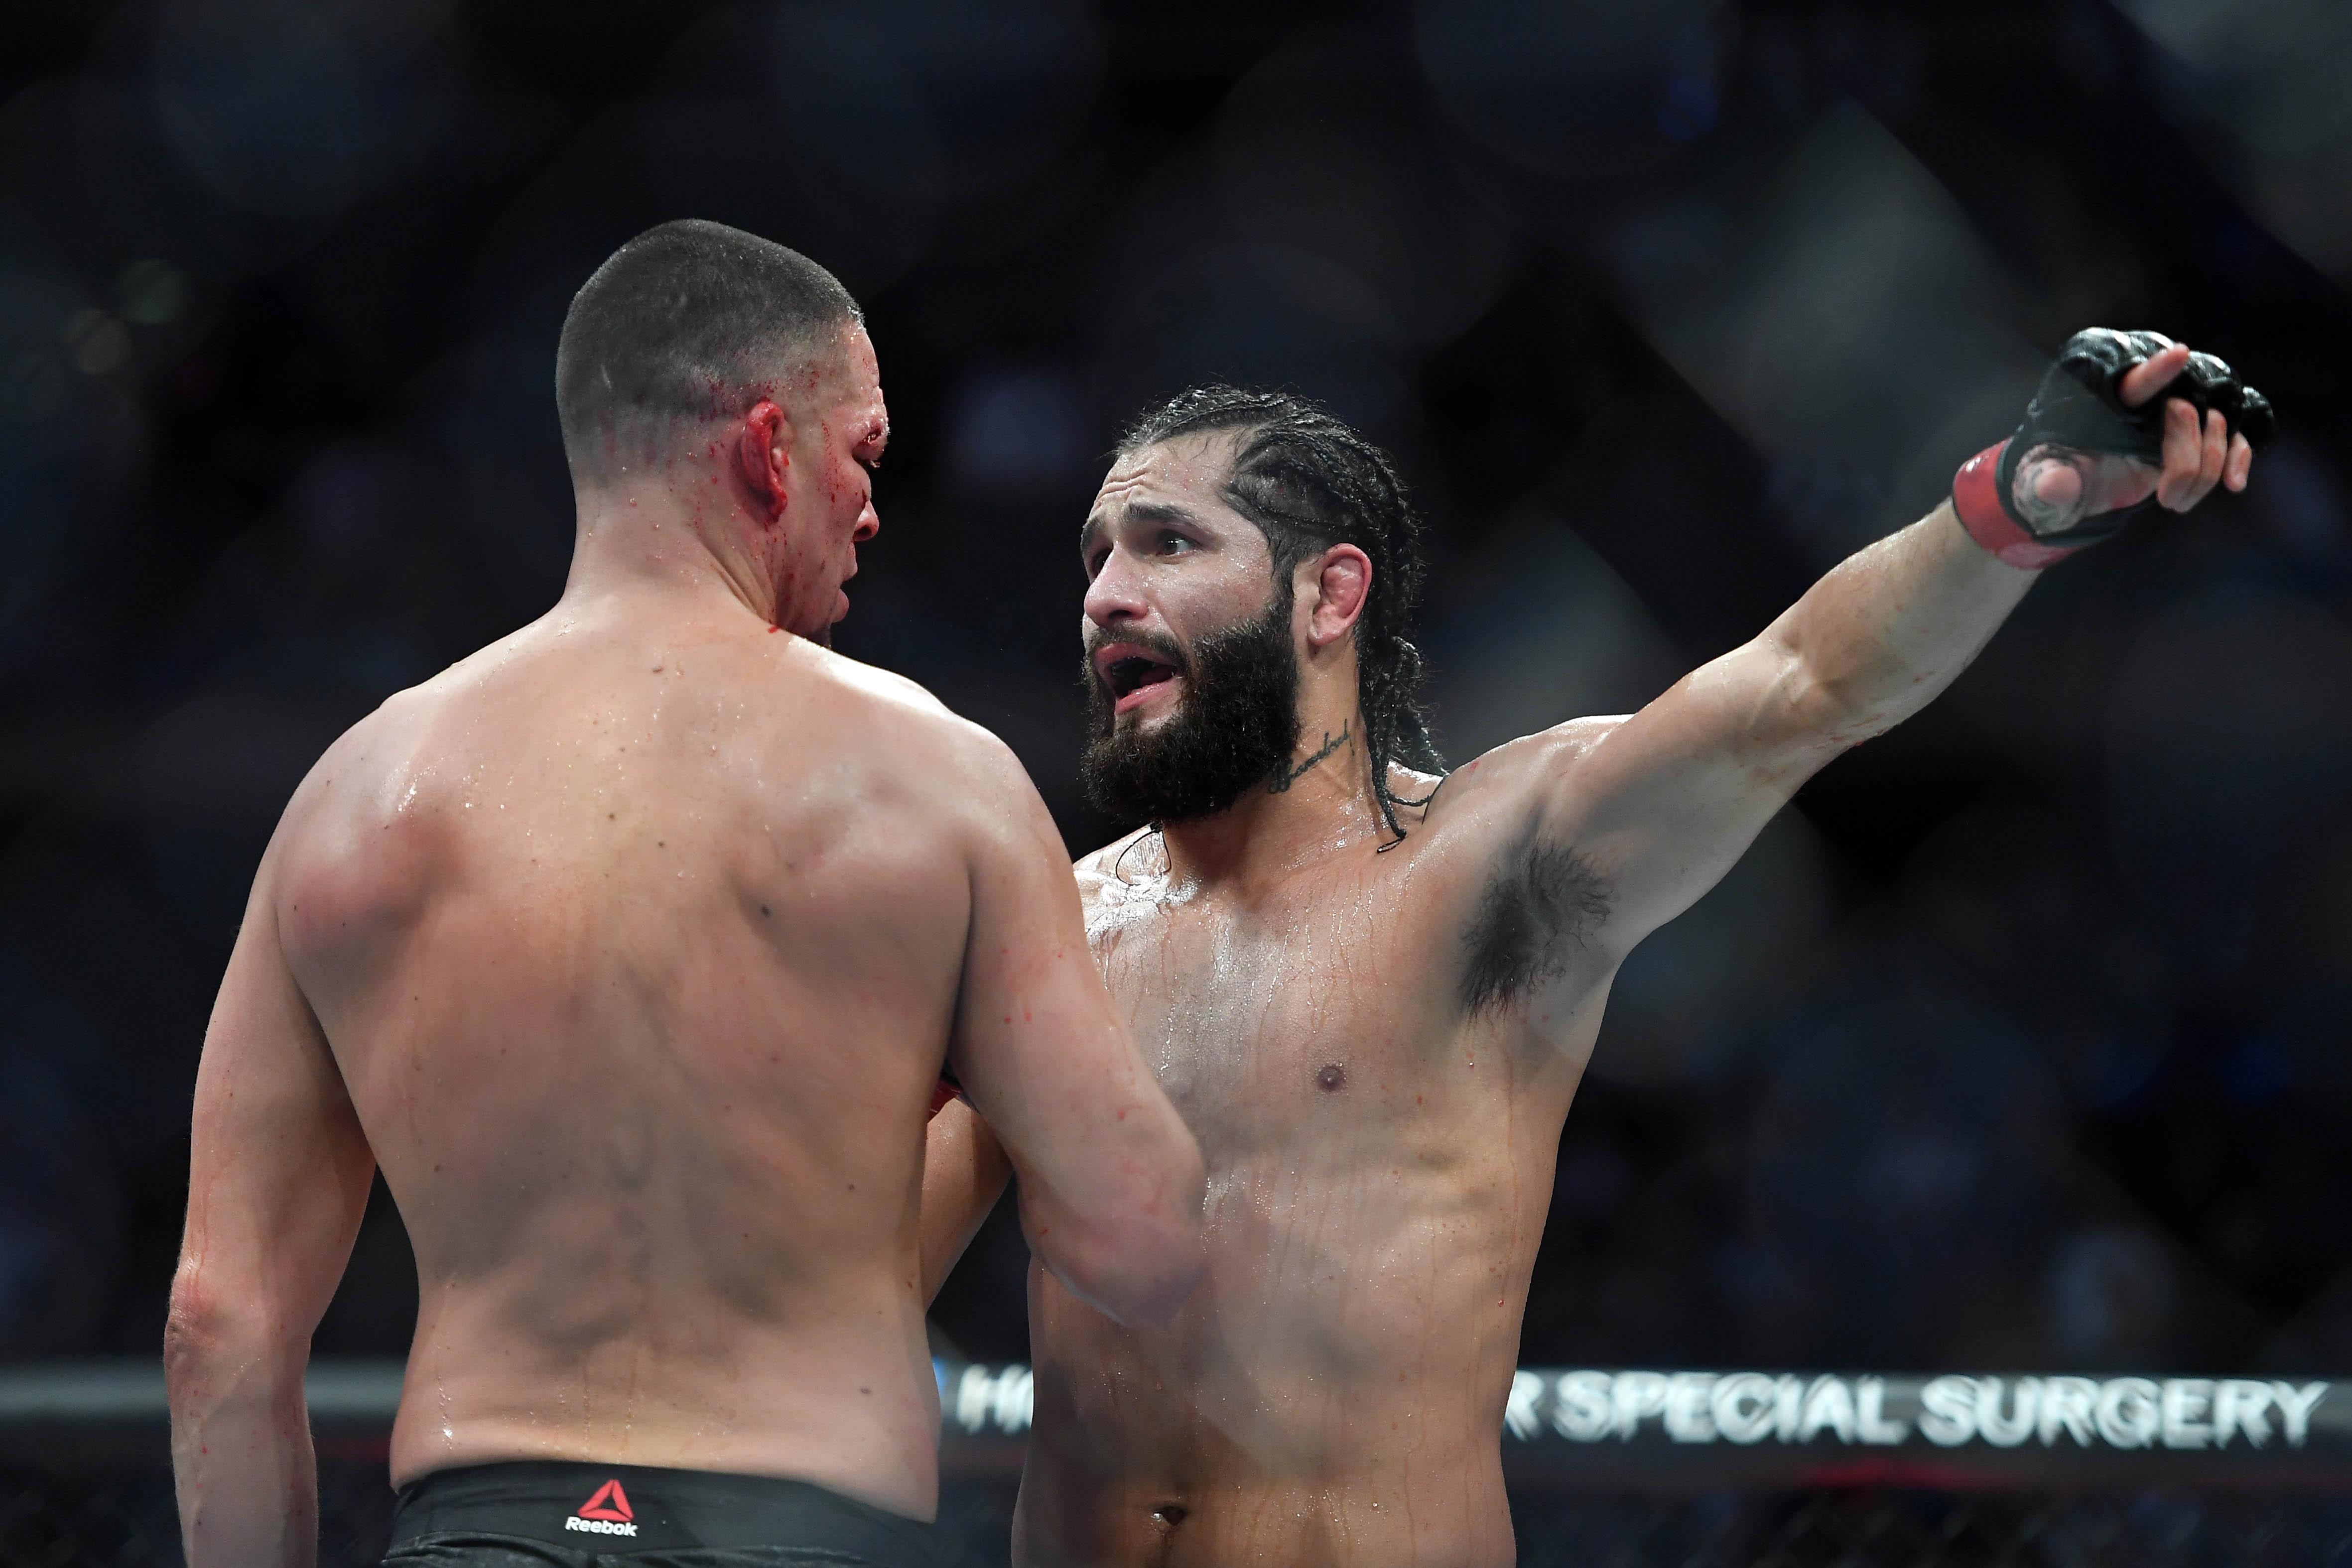 MMA: UFC 244-Masvidal vs Diaz